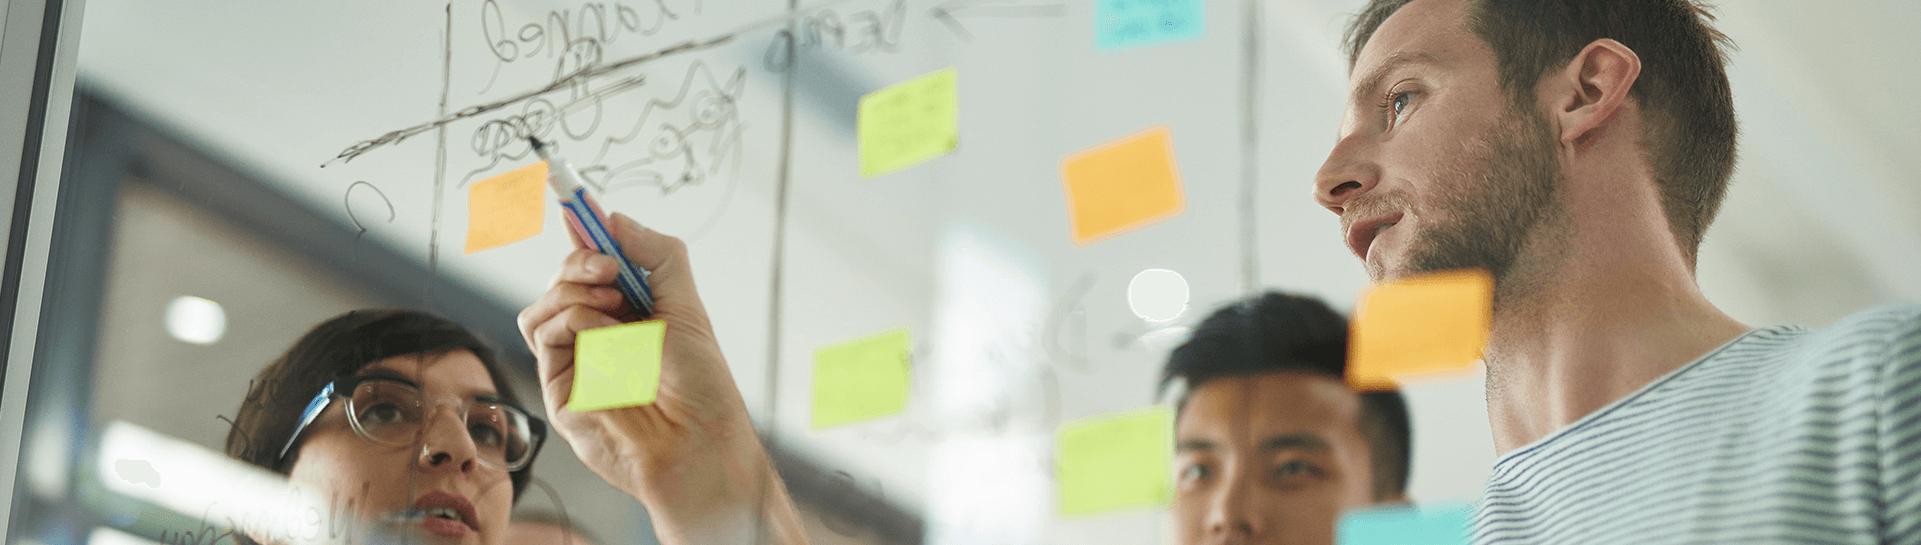 business professionals discuss strategies